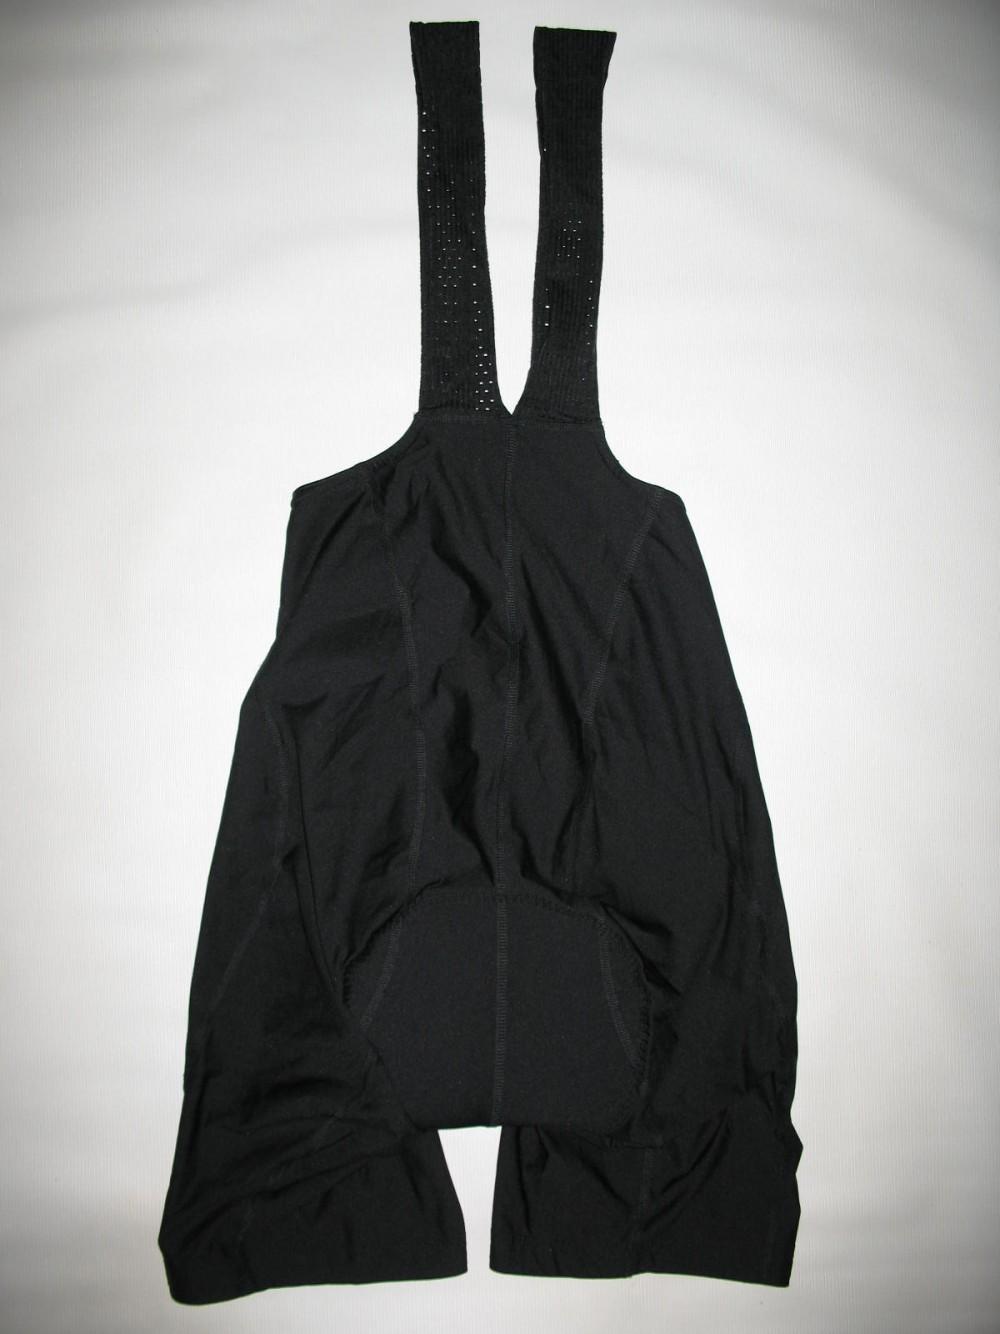 Велошорты LOFFLER bib cycling shorts (размер 56/XXL) - 3